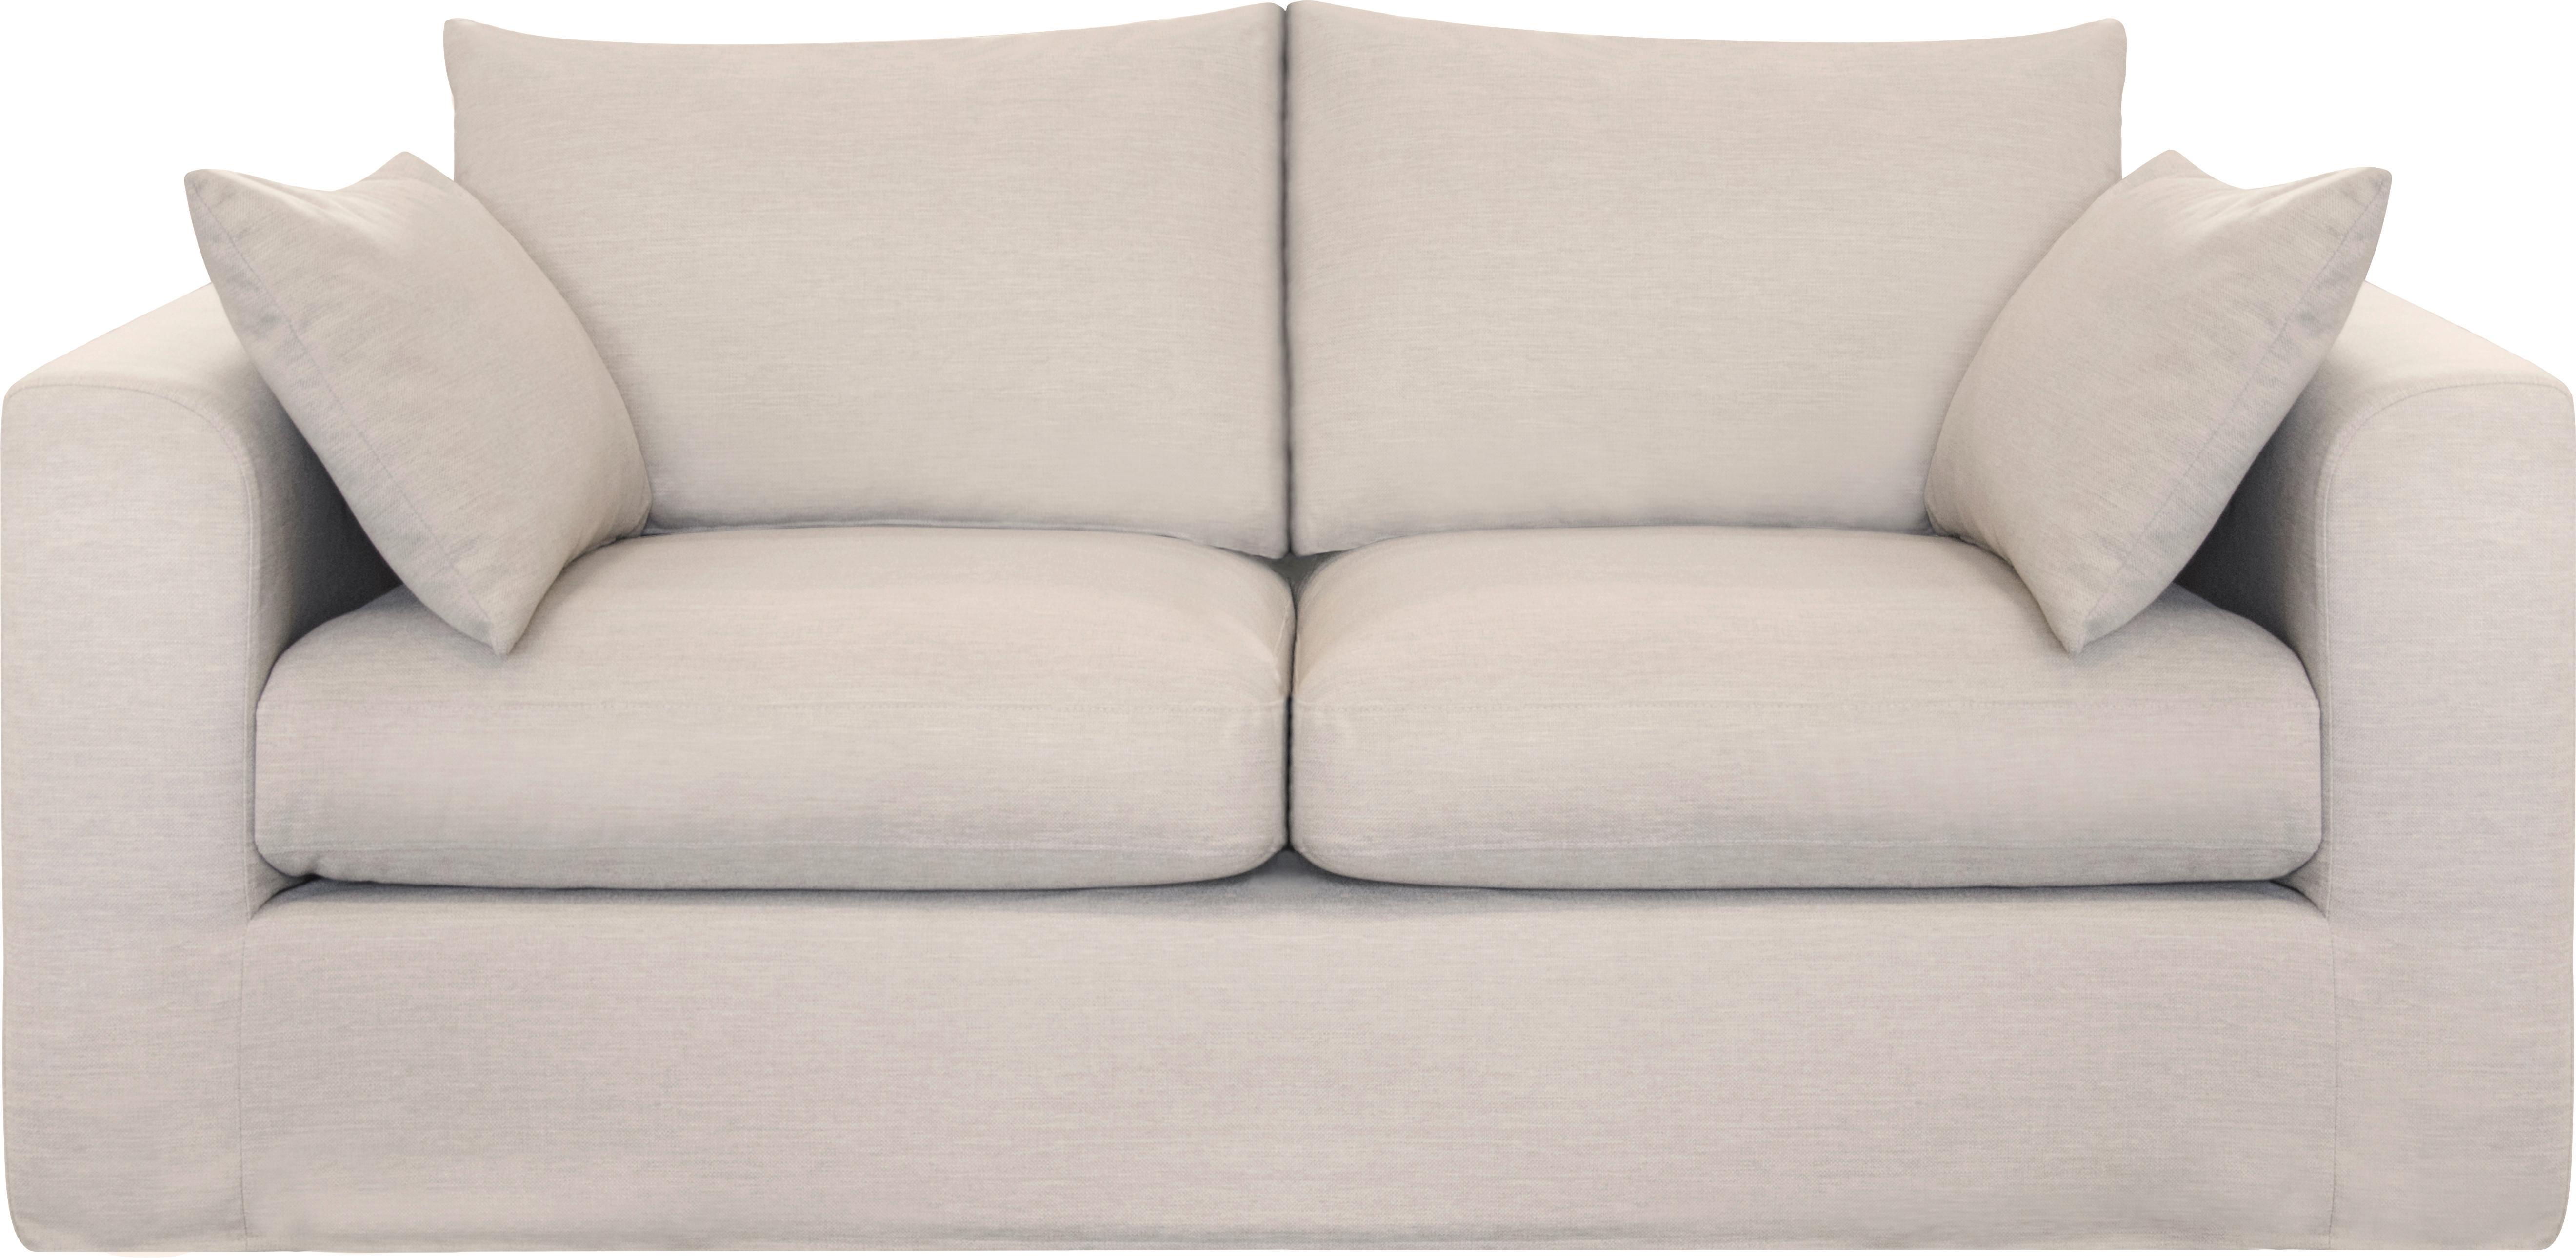 Divano 2 posti in tessuto grigio Zach, Rivestimento: 100% polipropilene, Struttura: truciolato e legno massic, Tessuto: beige, Larg. 191 x Prof. 90 cm